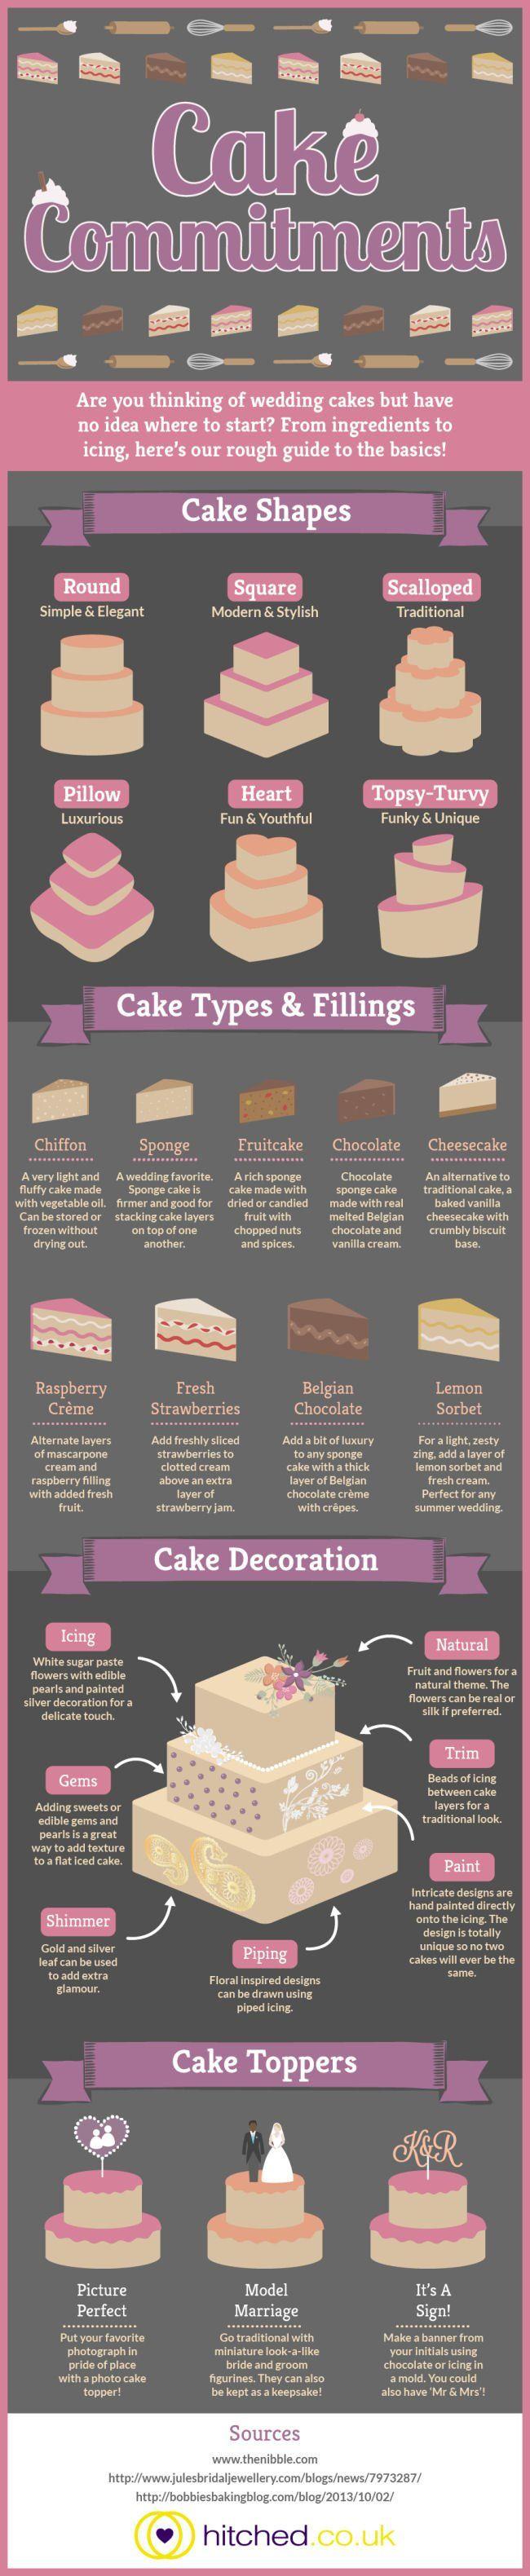 Types Of Wedding Cakes Landscaping Creative Wedding Cakes Types